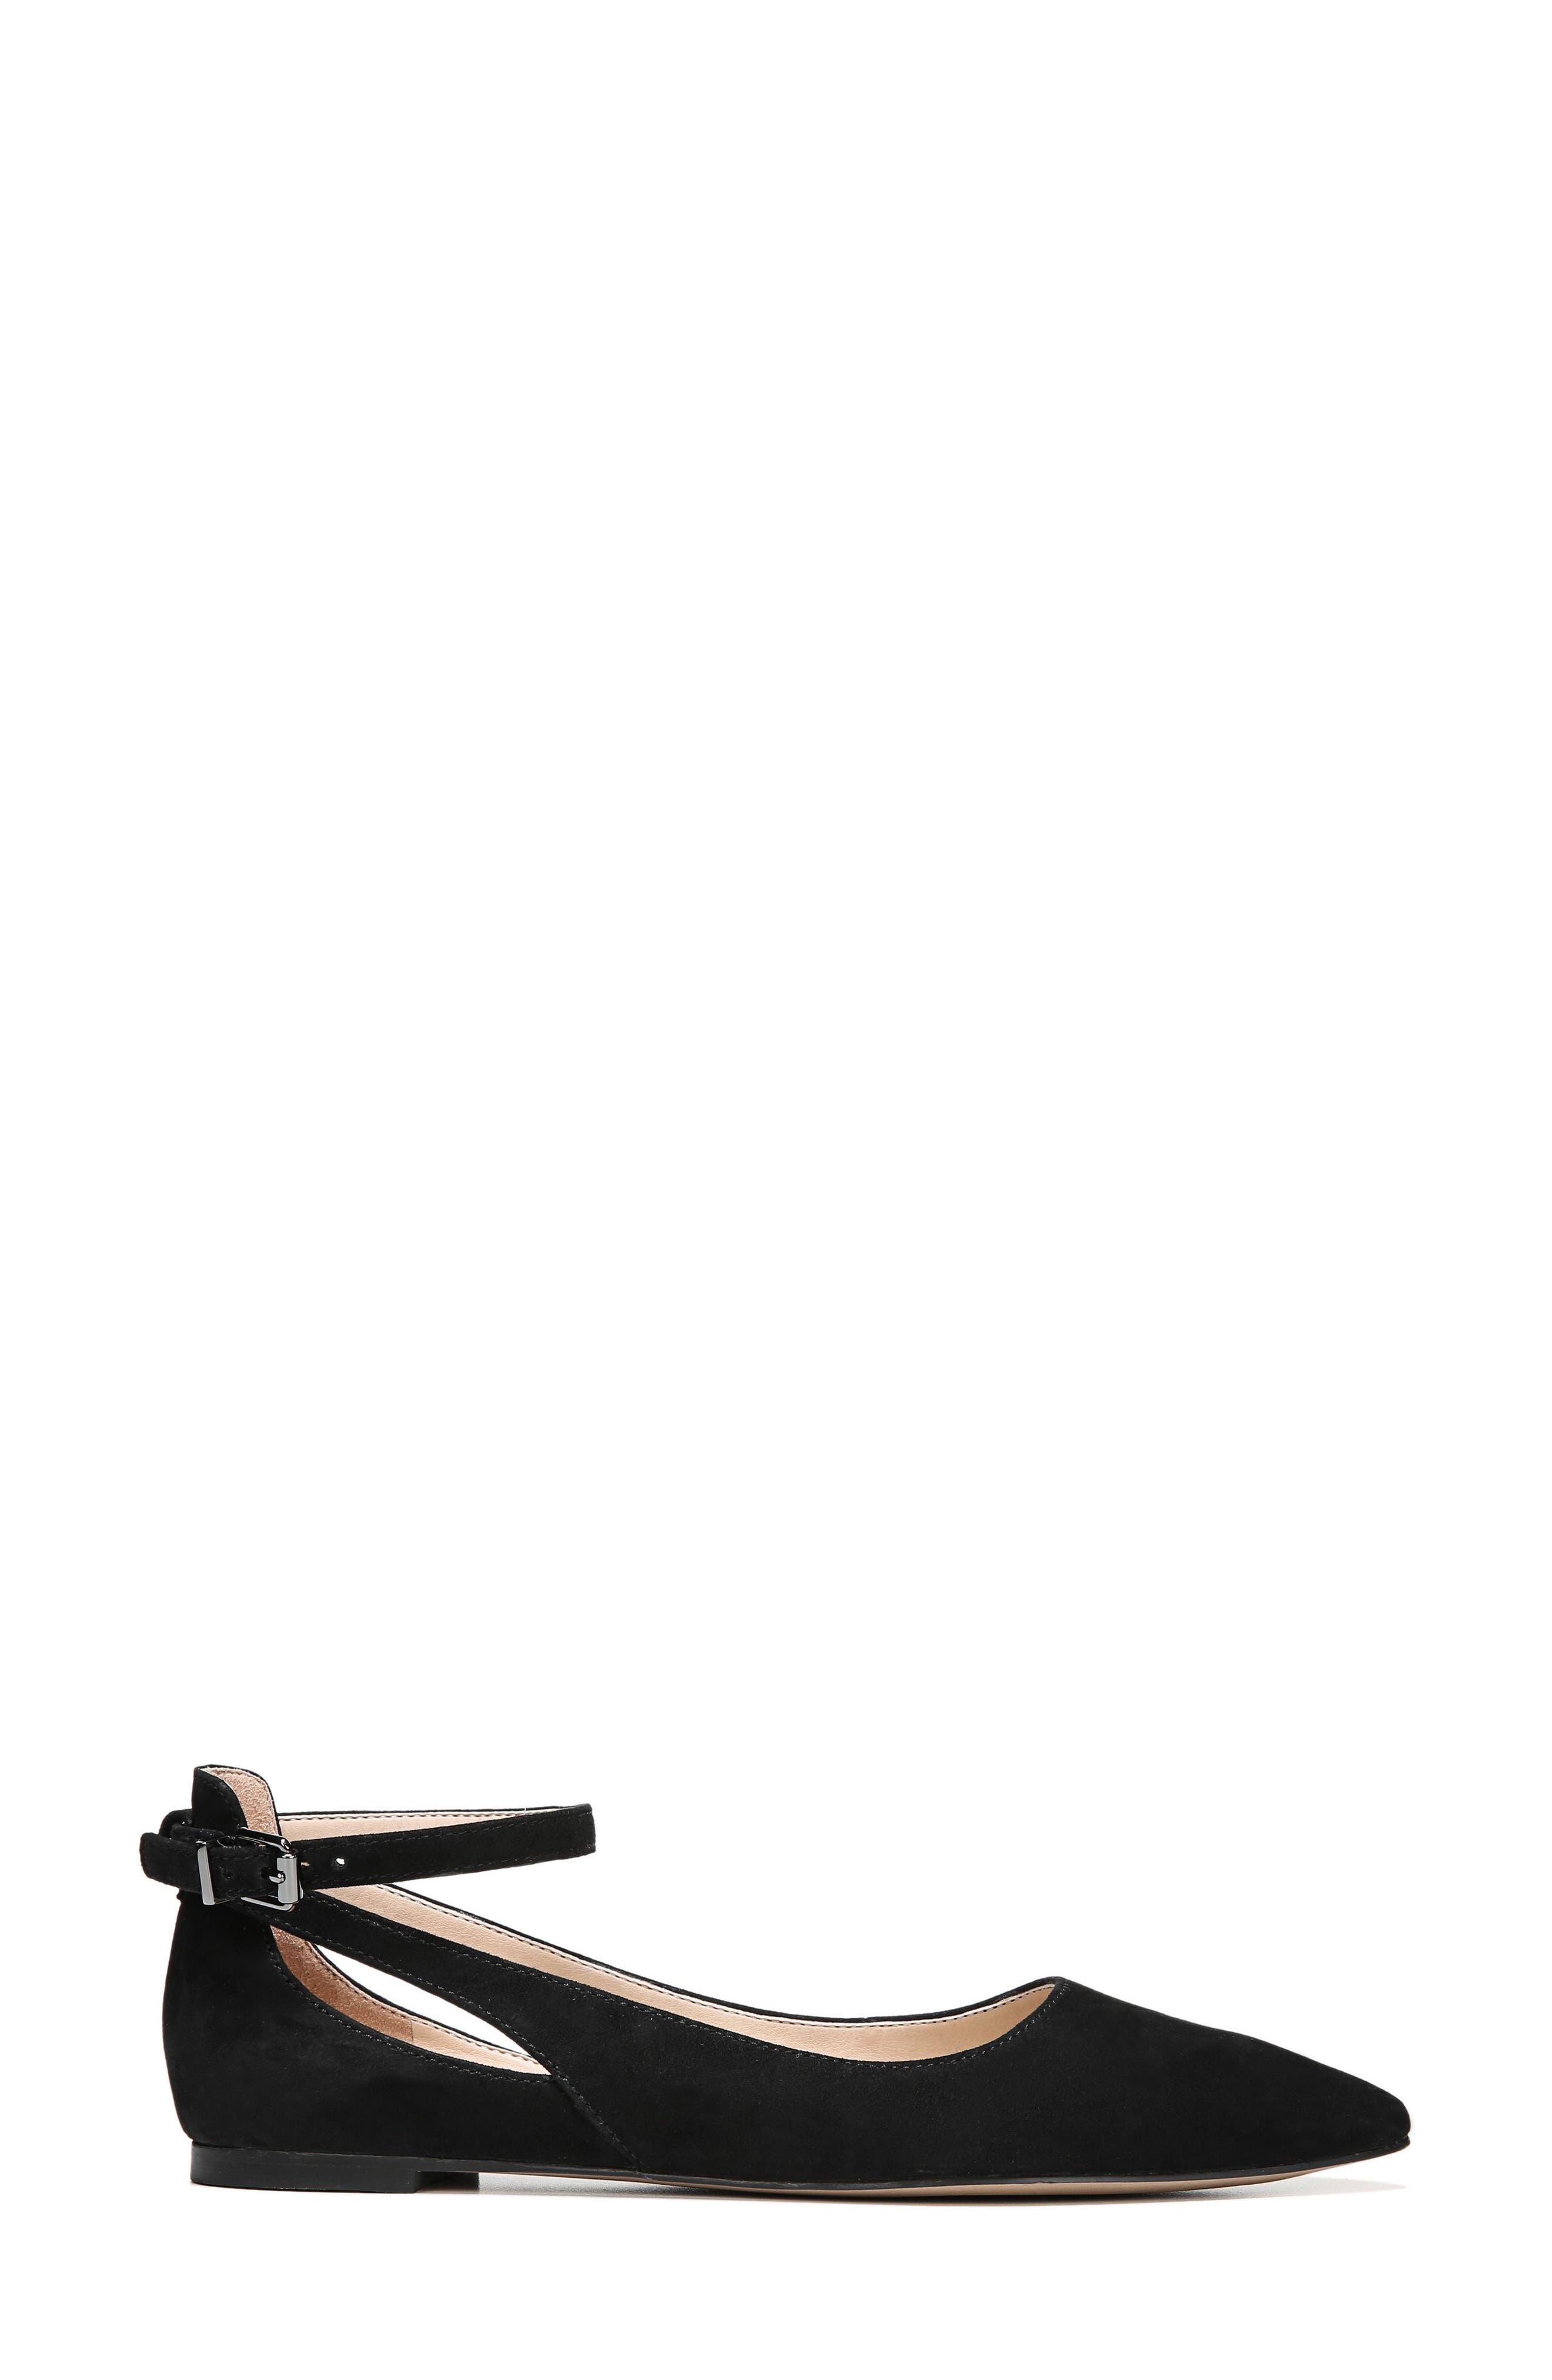 Sylvia Ankle Strap Flat,                             Alternate thumbnail 2, color,                             Black Suede